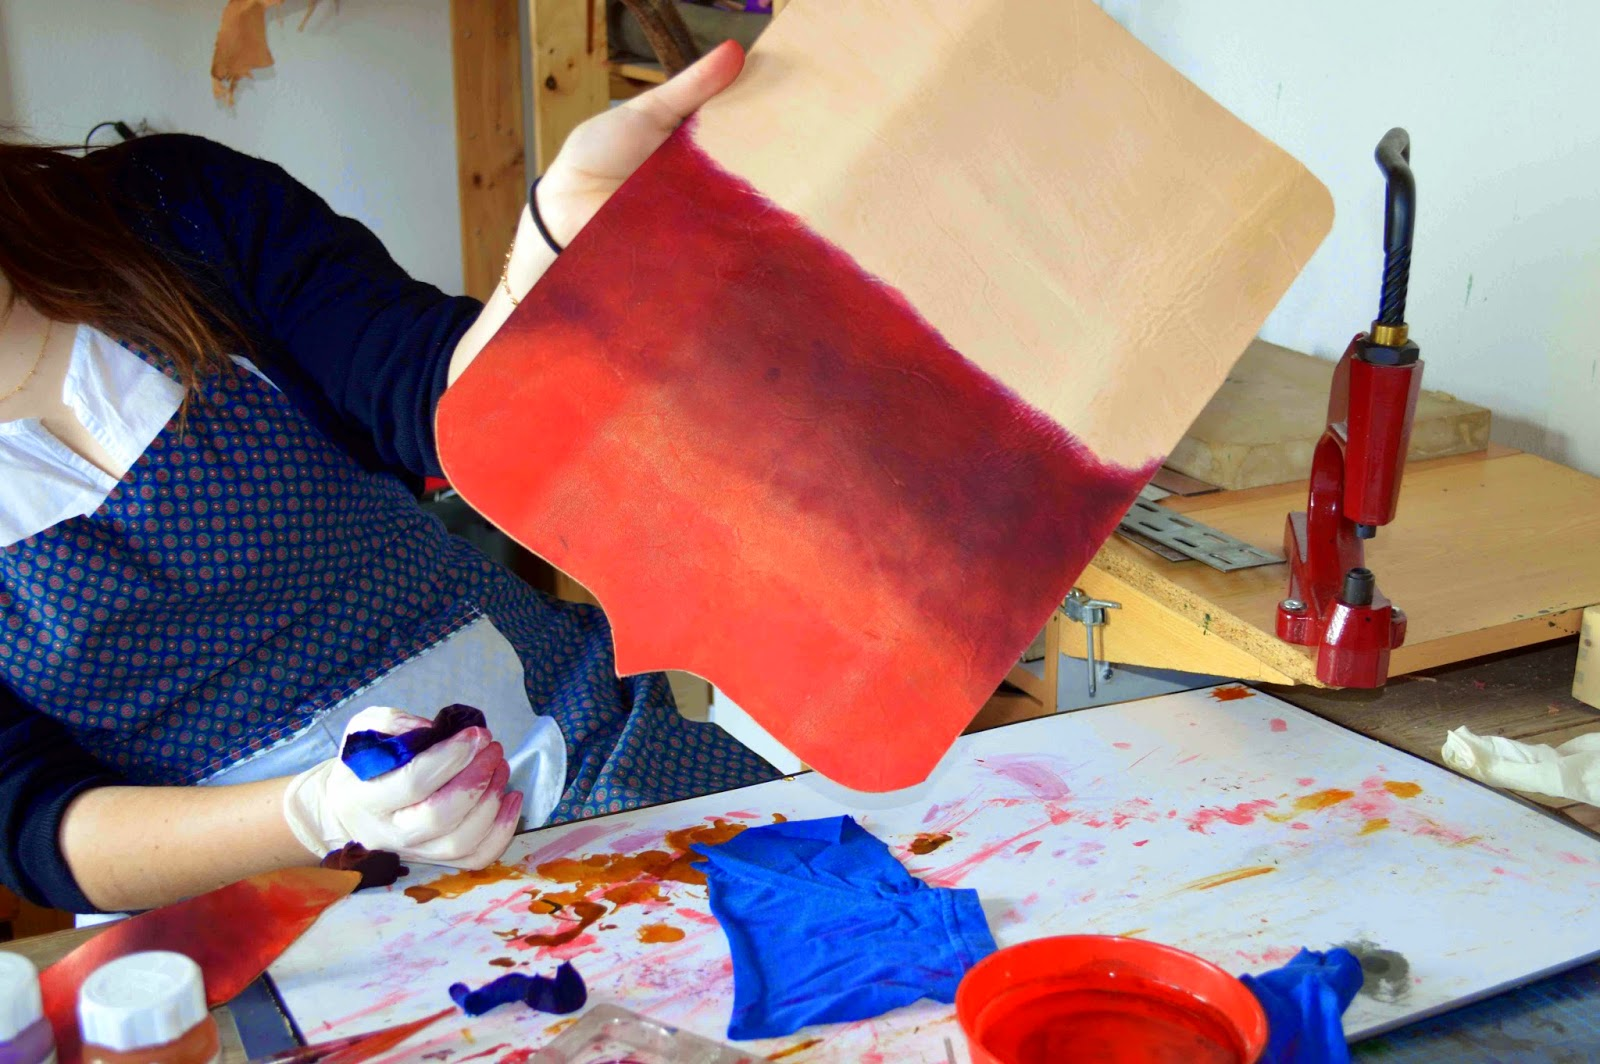 Lisette atelier fa rie cuir du vercors stage bac pro m tiers du cuir s verine semaine 3 - Teinter du cuir ...